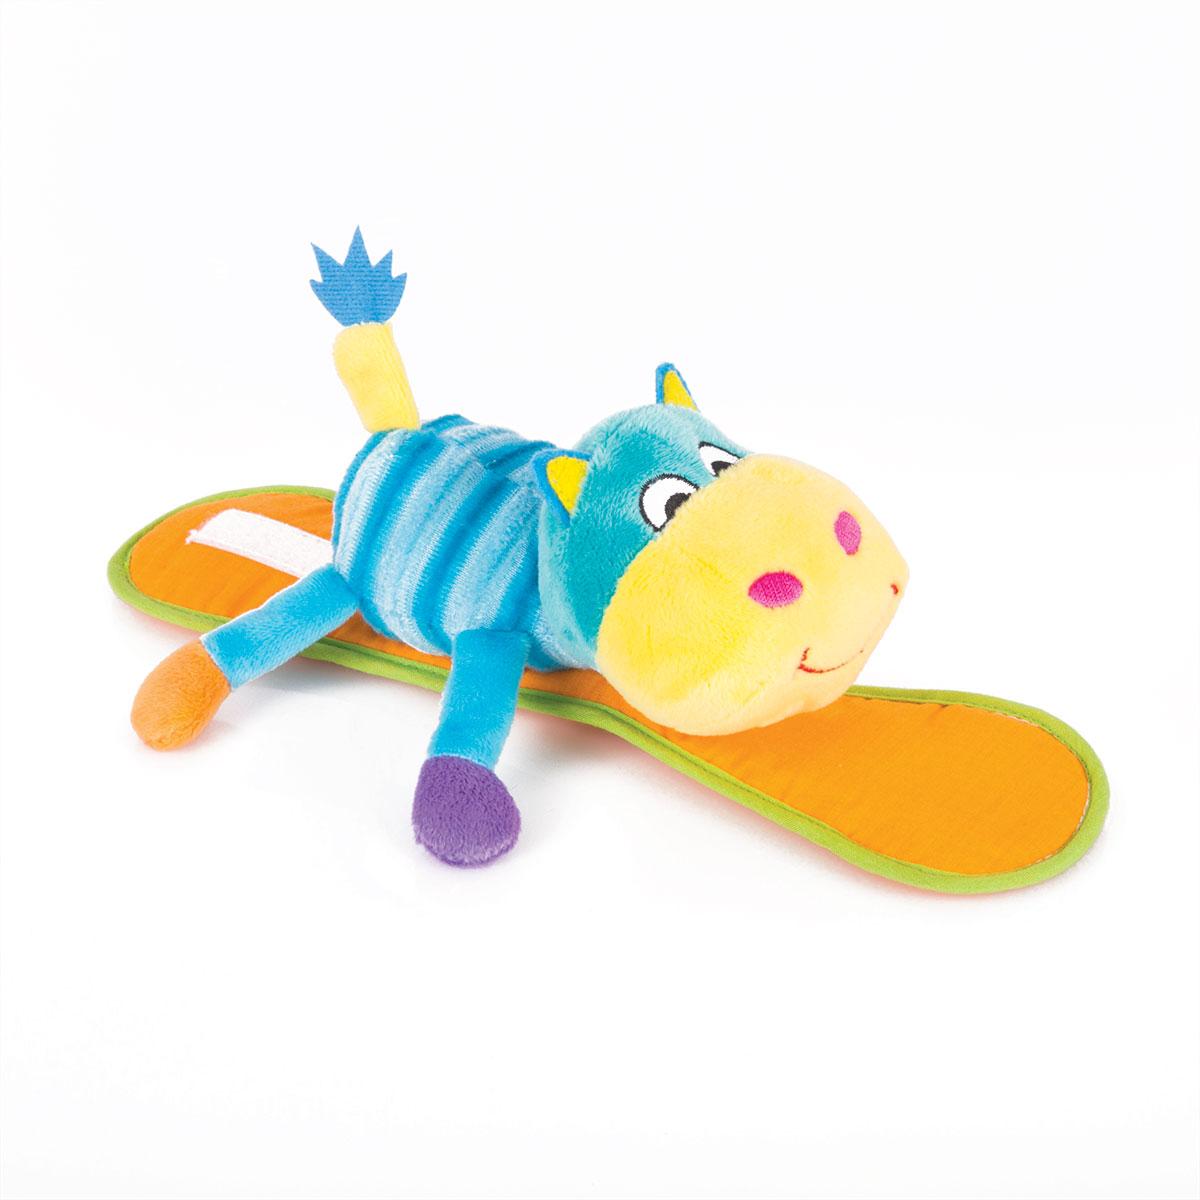 Happy Snail Развивающая игрушка Бегемот Бубба